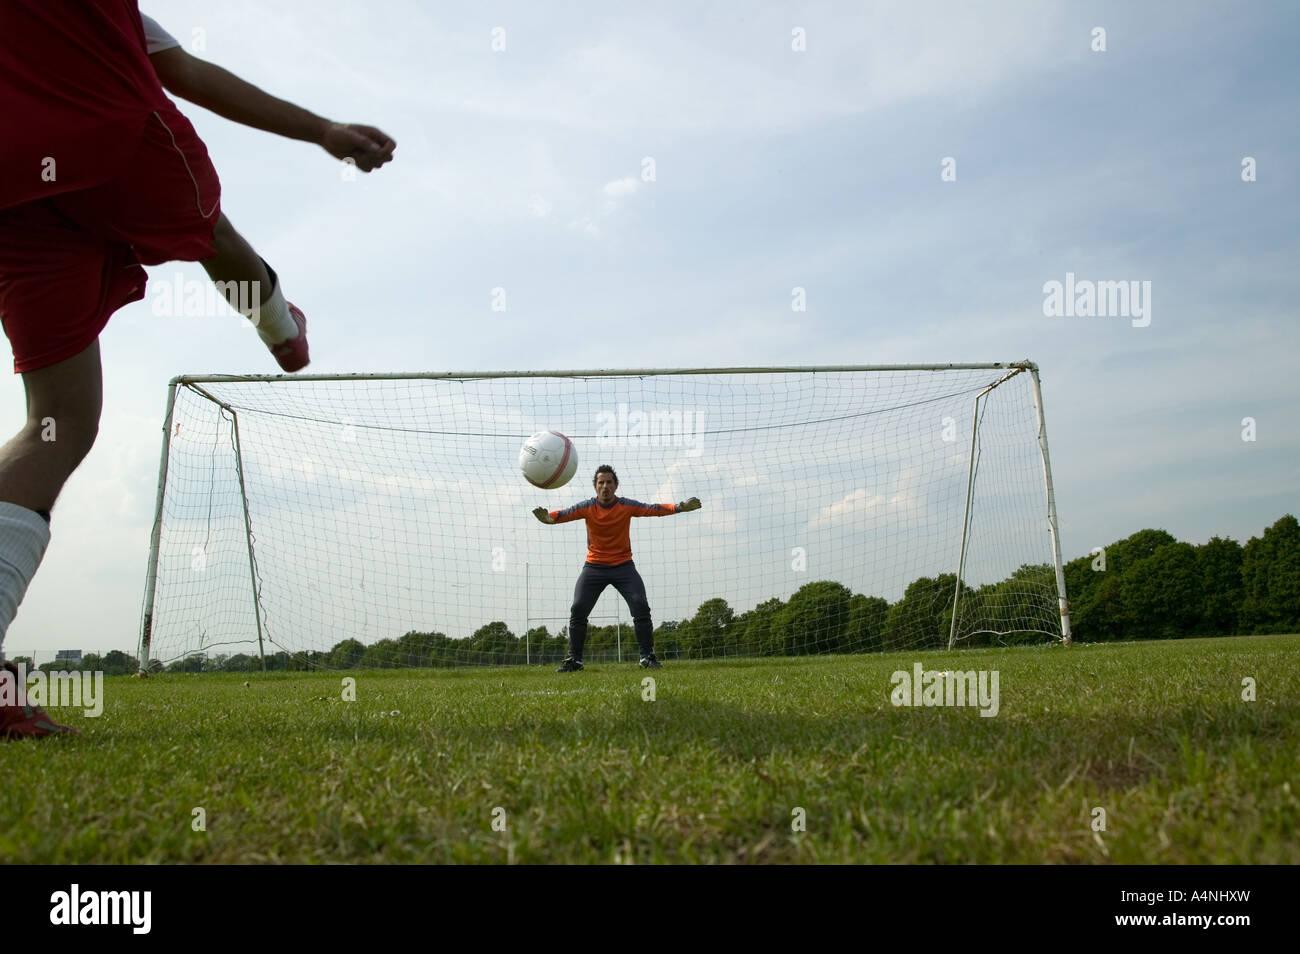 Soccer Penalty Shot - Stock Image